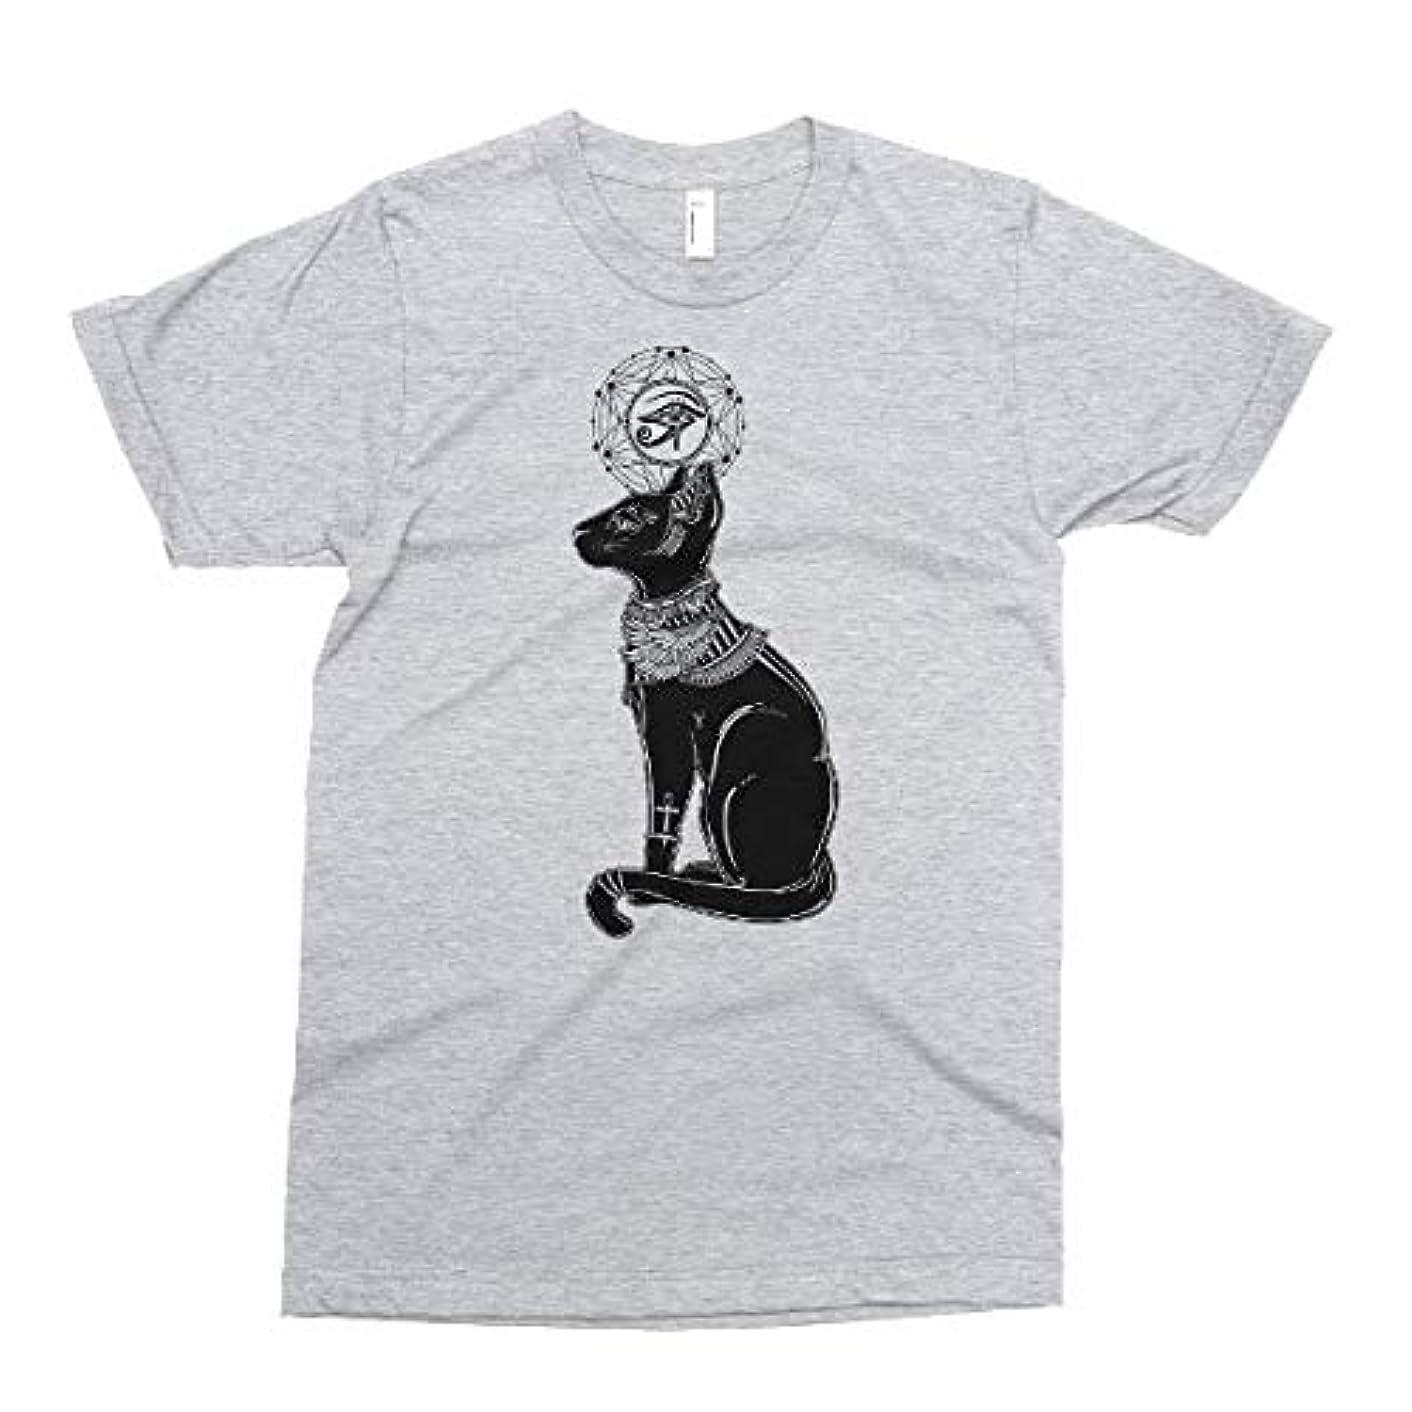 Egyptian Cat God Tshirt, Bastet, Goddess Eye Of Horus T shirt, Printed on American Apparel Tees, Women's Jr. Fit